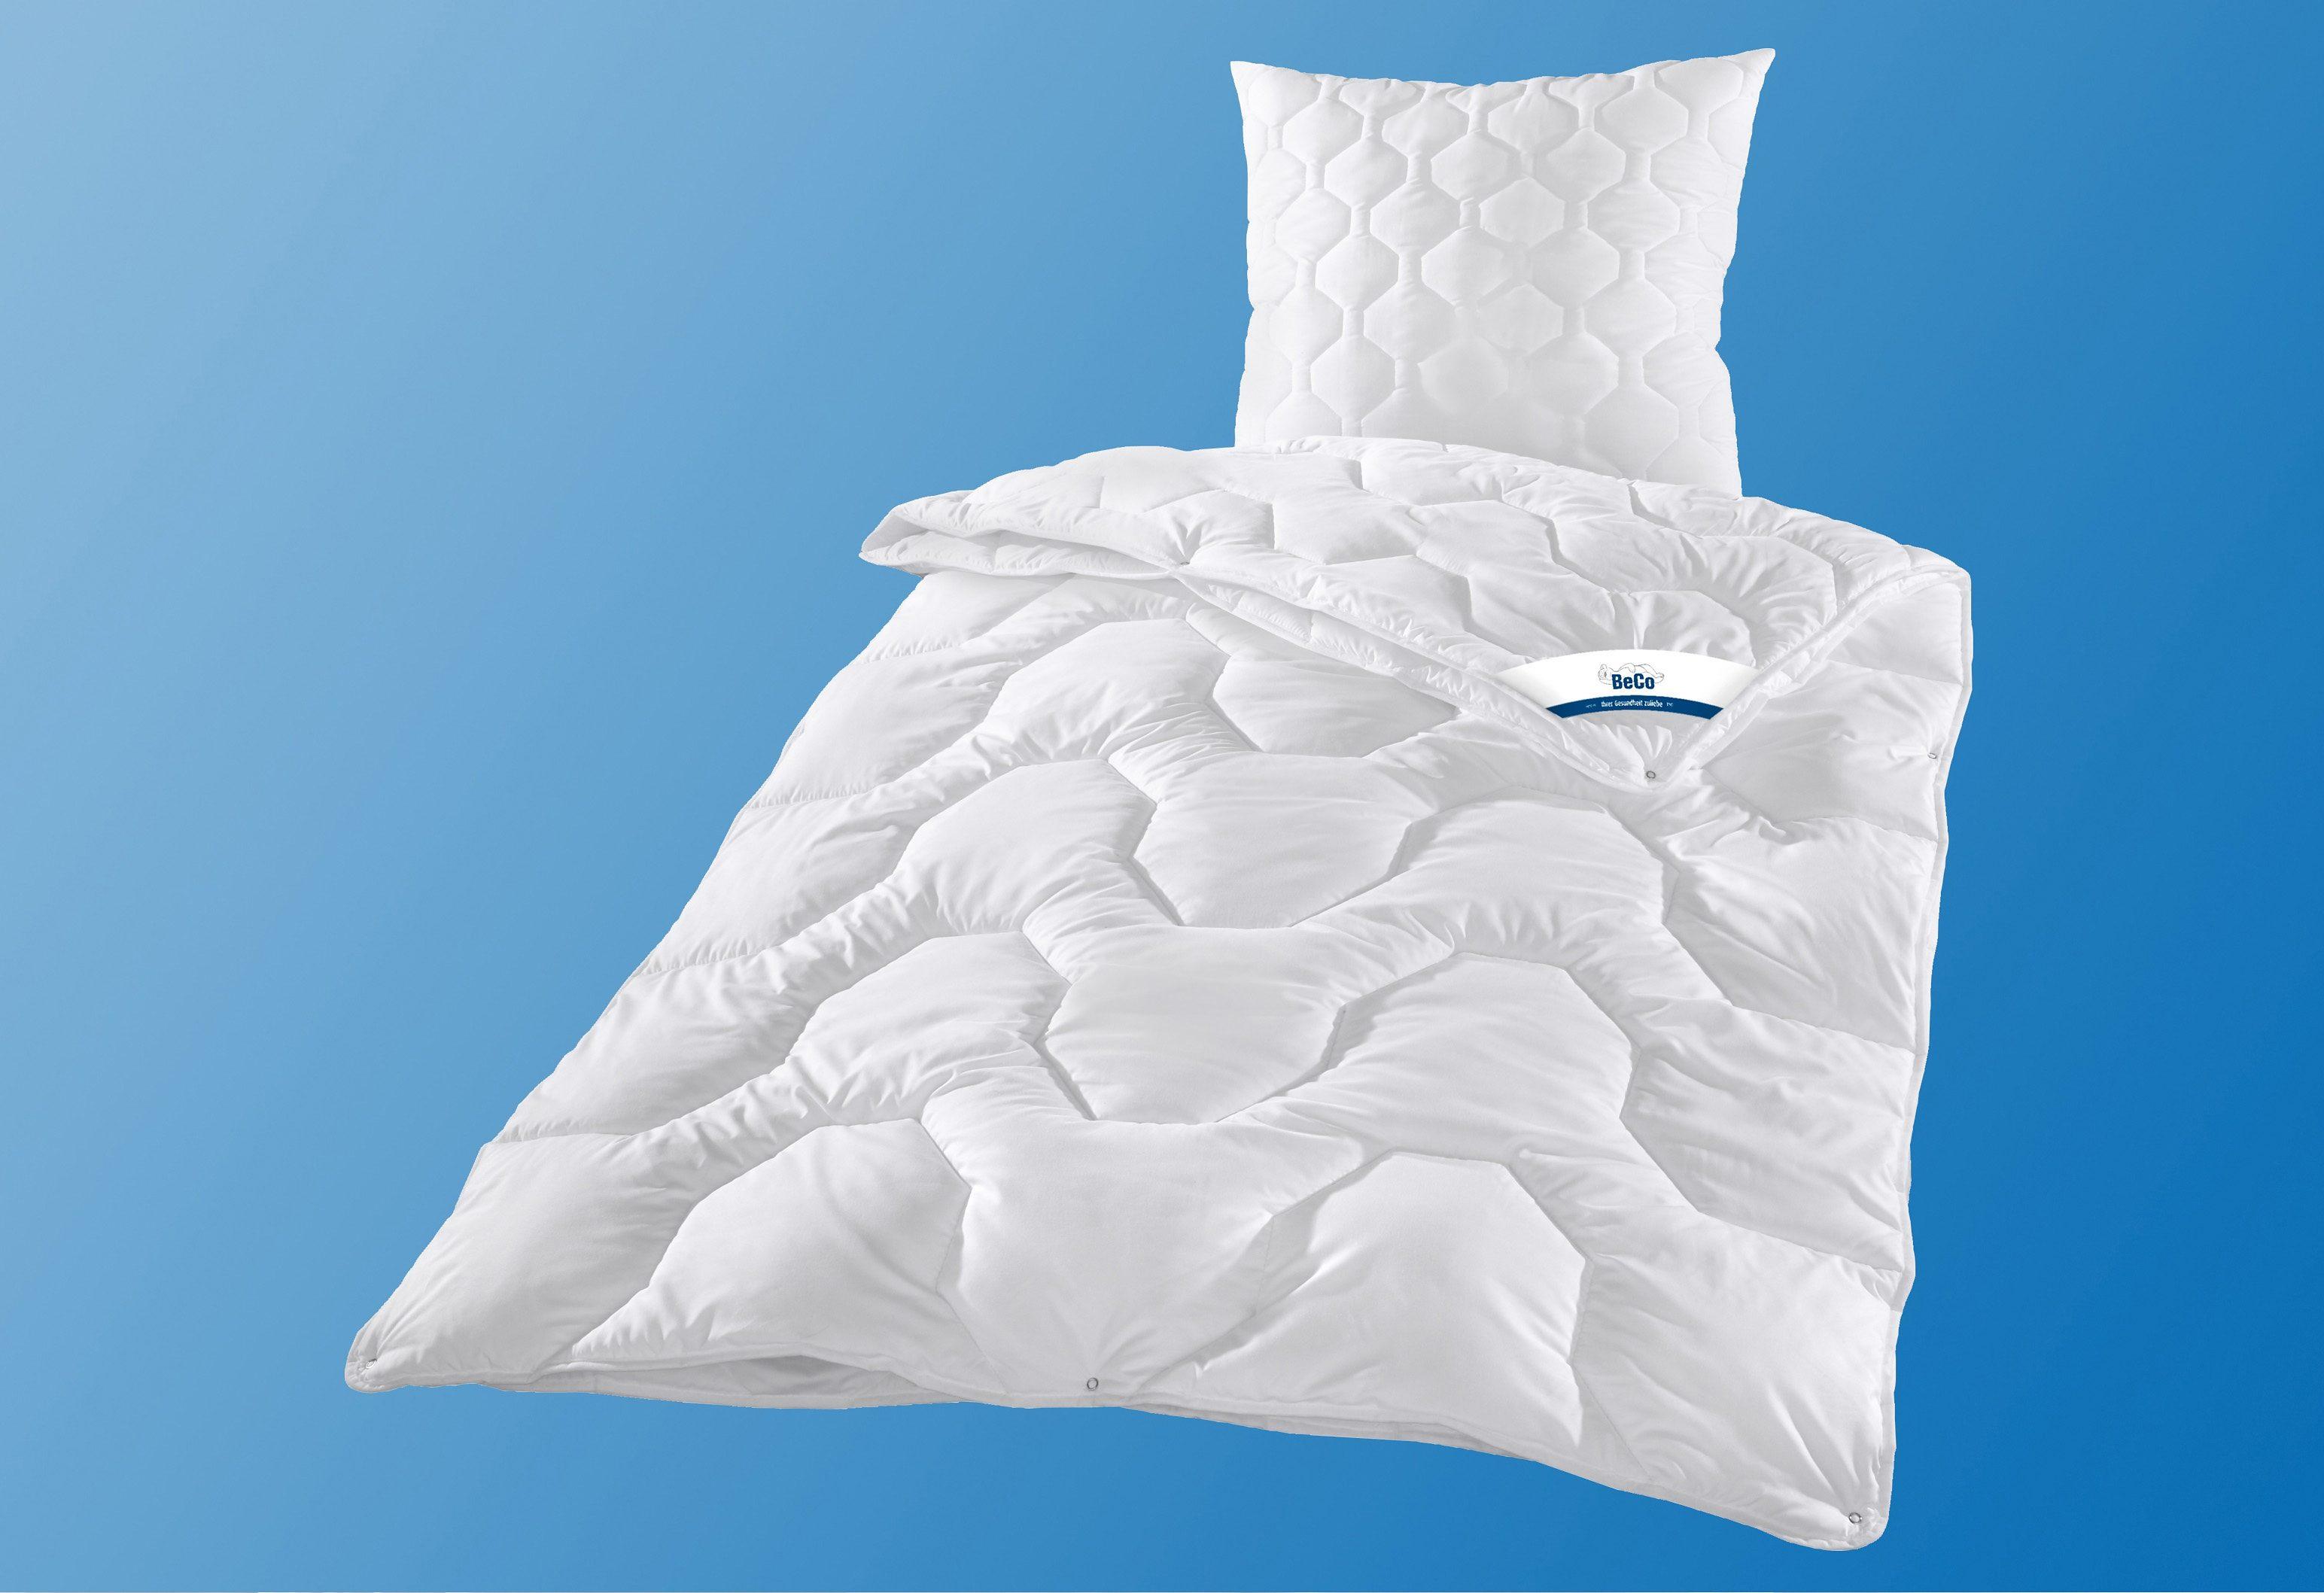 Kunstfaserbettdecke Cotton 95 Beco Fullung Hcs Klimafaser Bezug Baumwoll Perkal Kaufen Baur